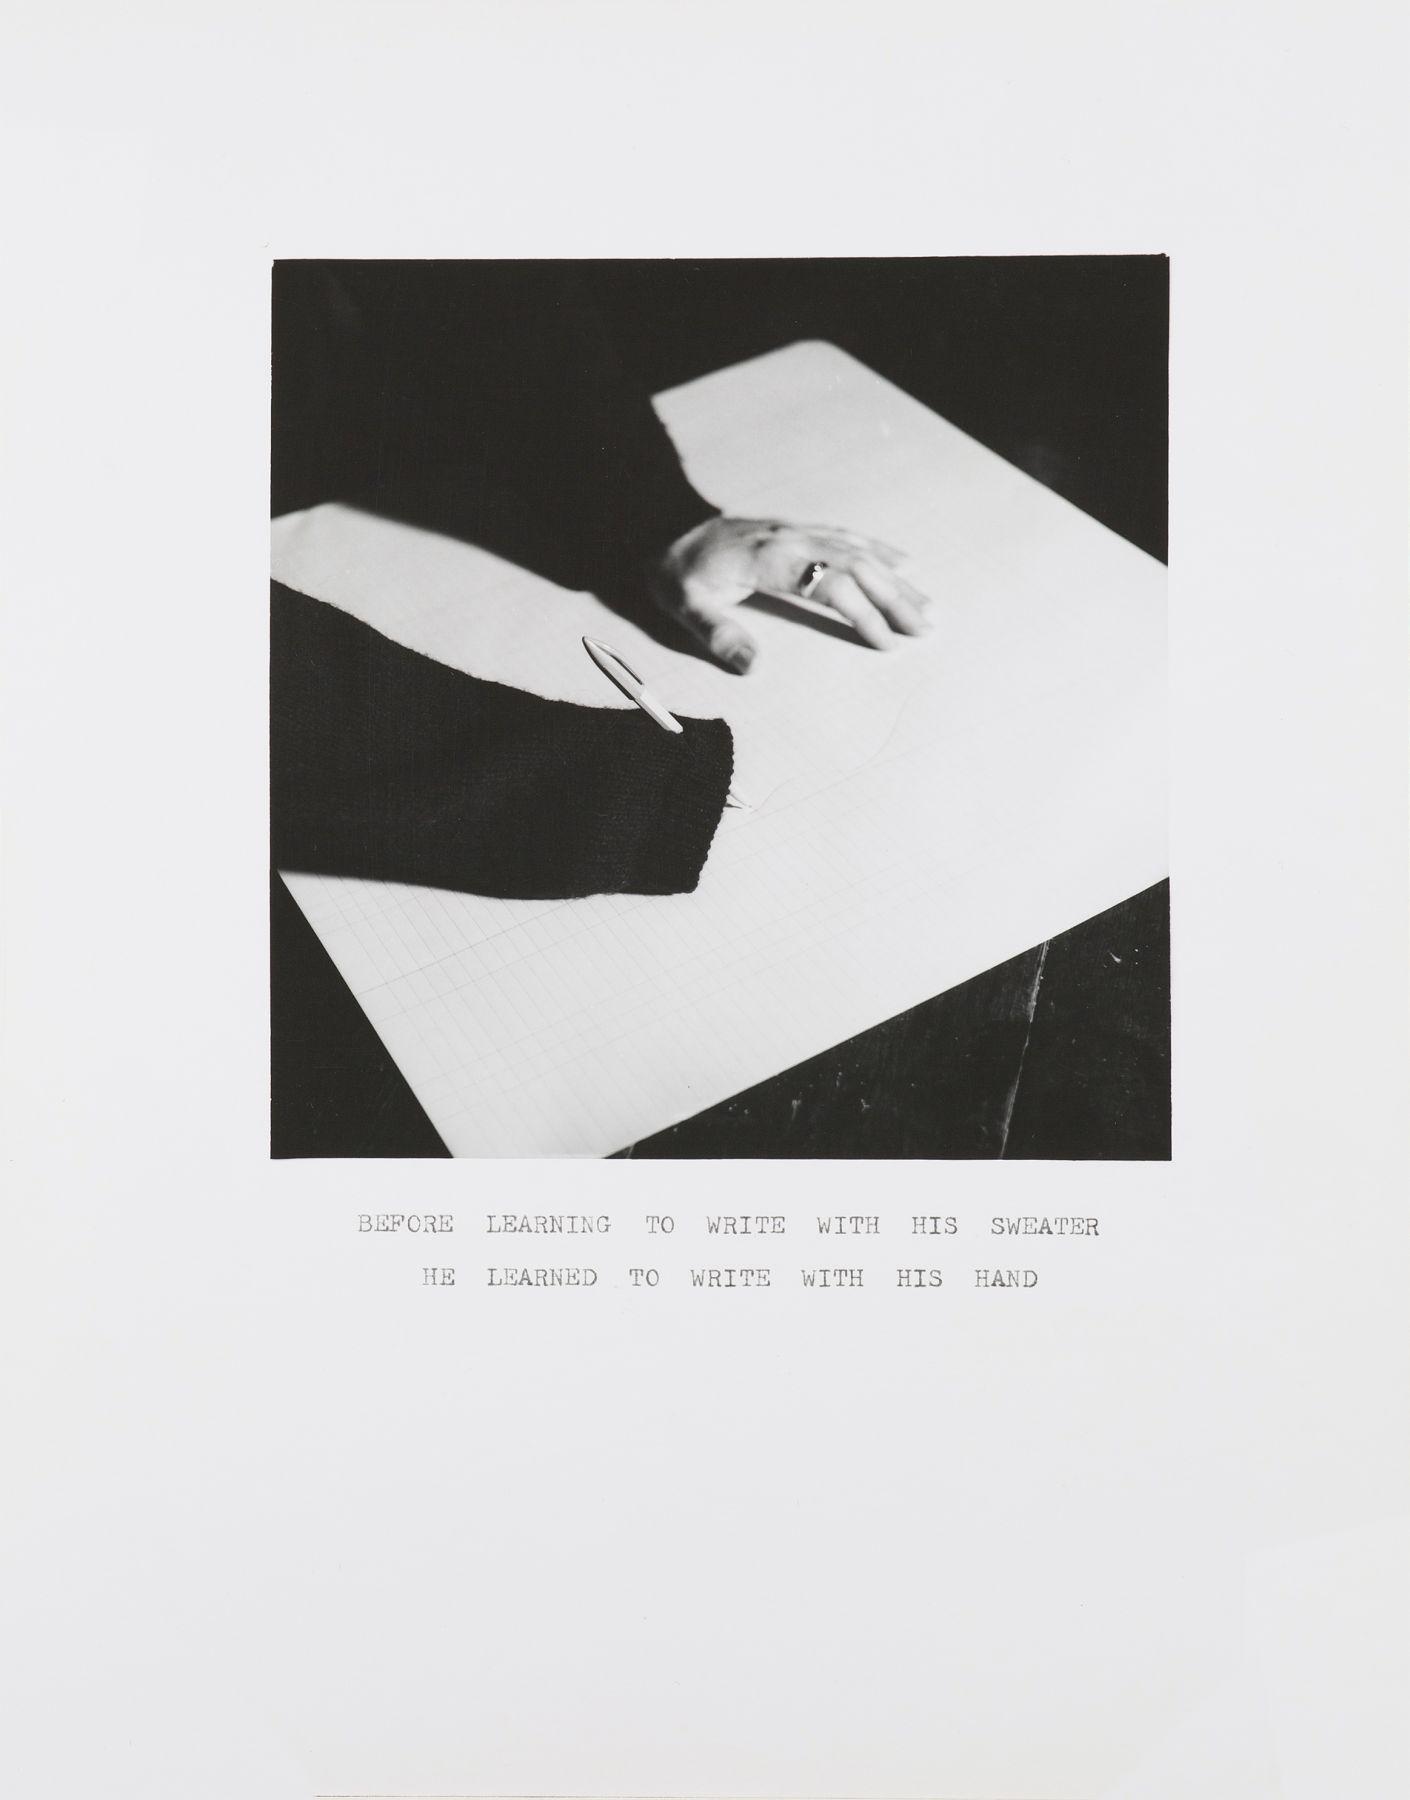 William Wegman,Sweater Wiring, 1972.